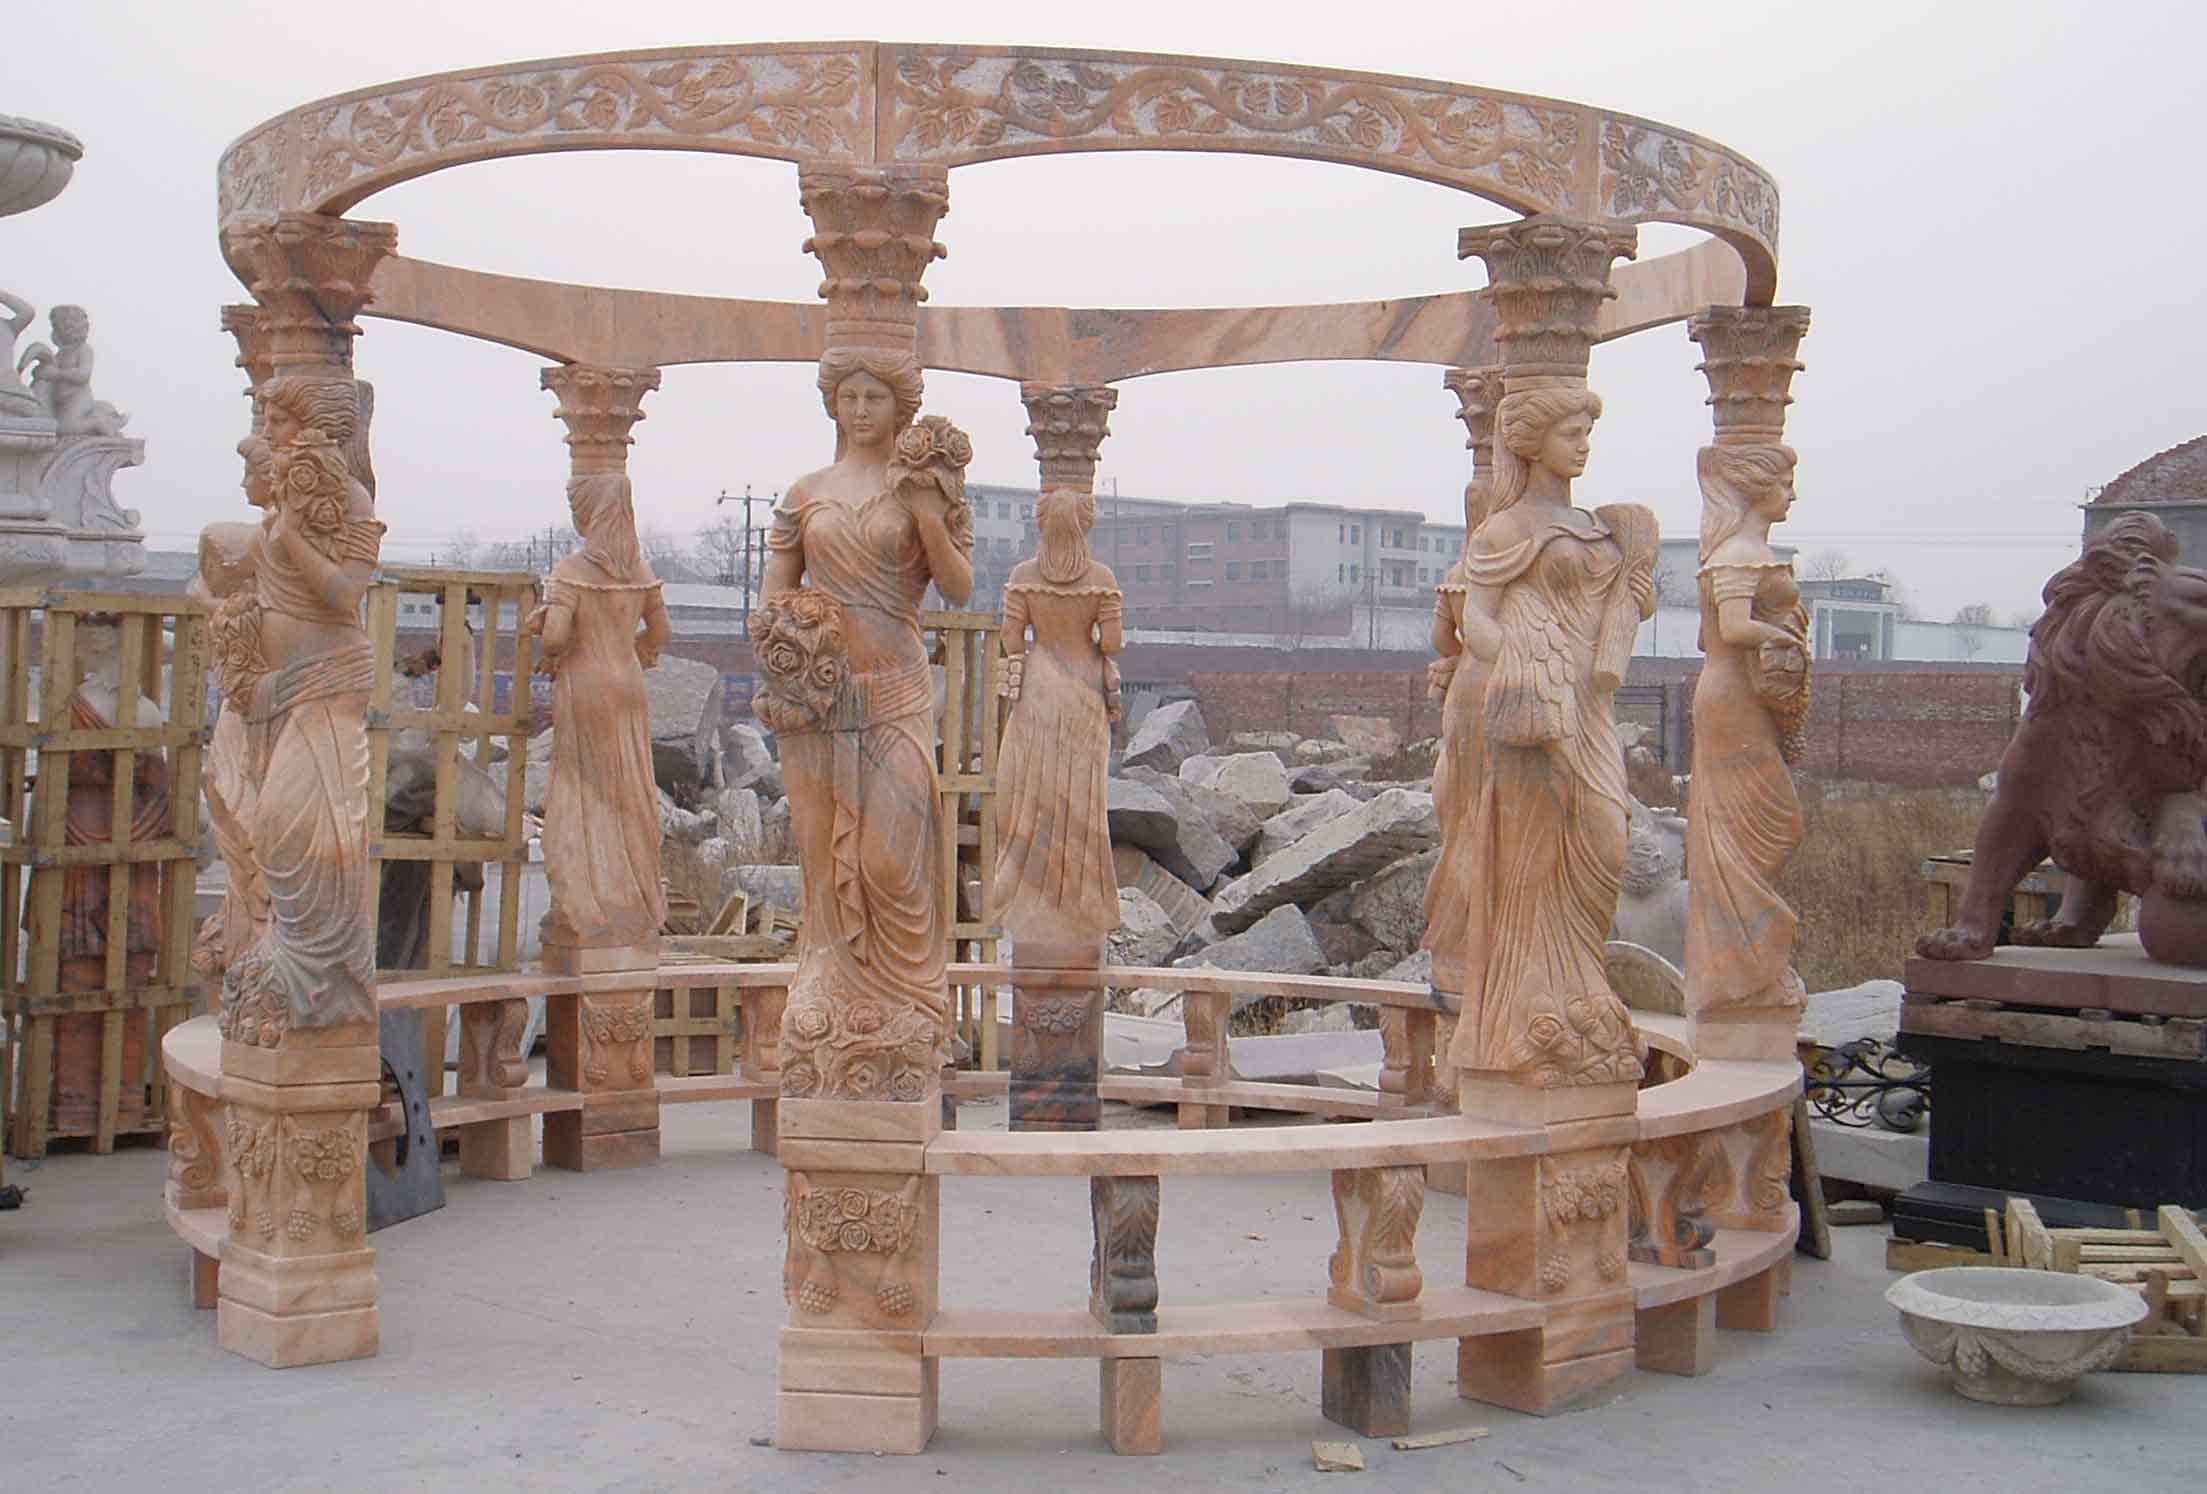 Marmo giardino gazebo con tetto in ferro e lady colonna giardino ...